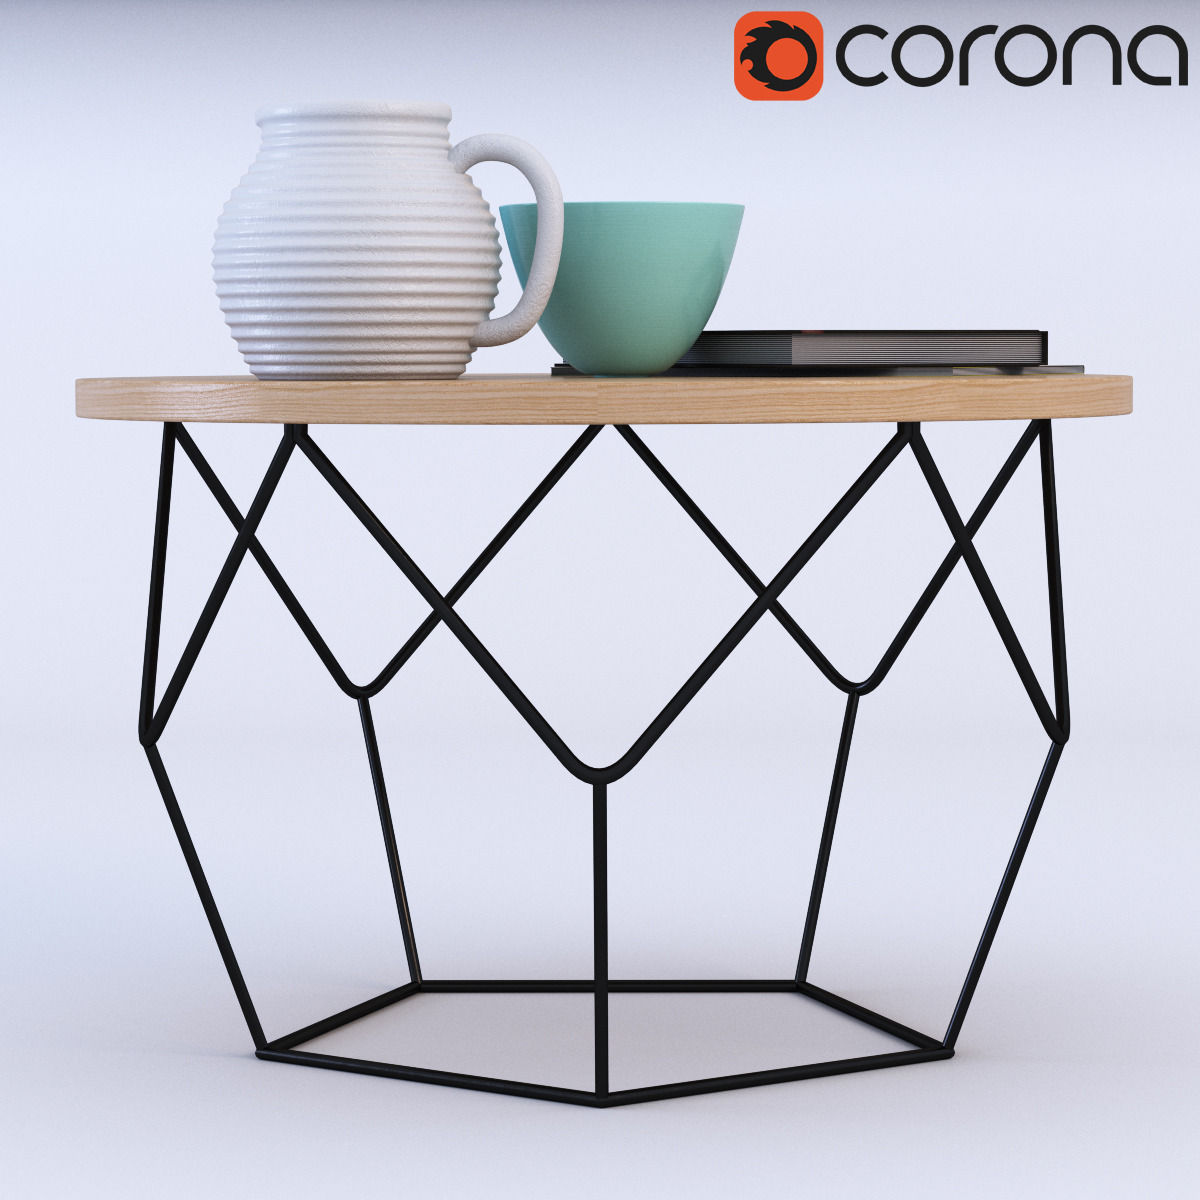 Beau ... West Elm Origami Coffee Table 3d Model Max Obj Fbx Mtl 2 ...